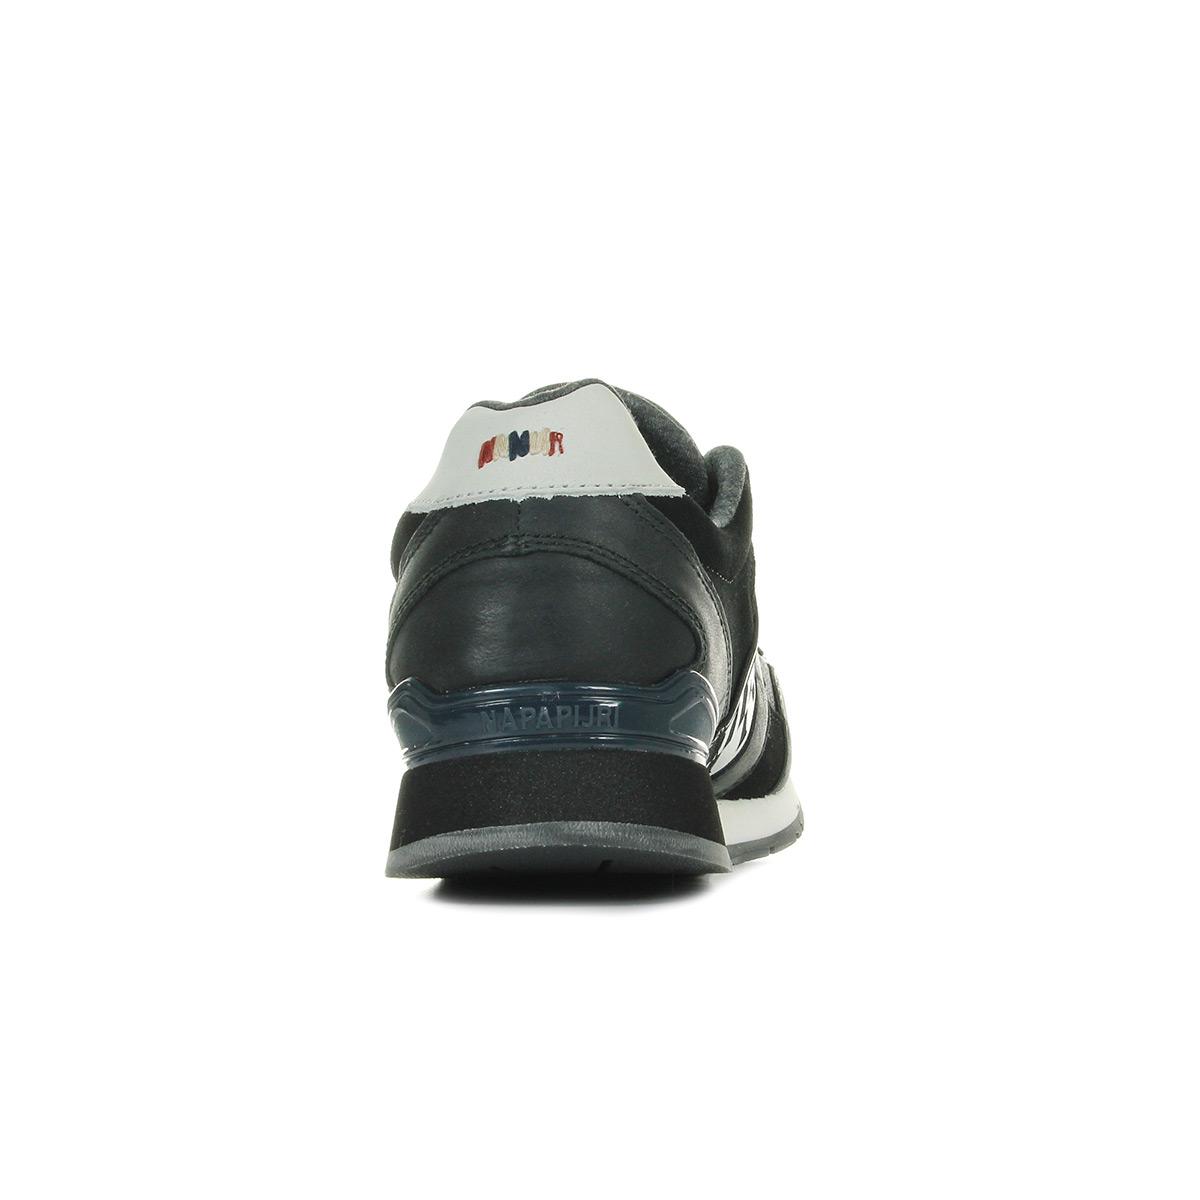 Napapijri Rabari Leather Suede 15831203N00, Baskets mode homme